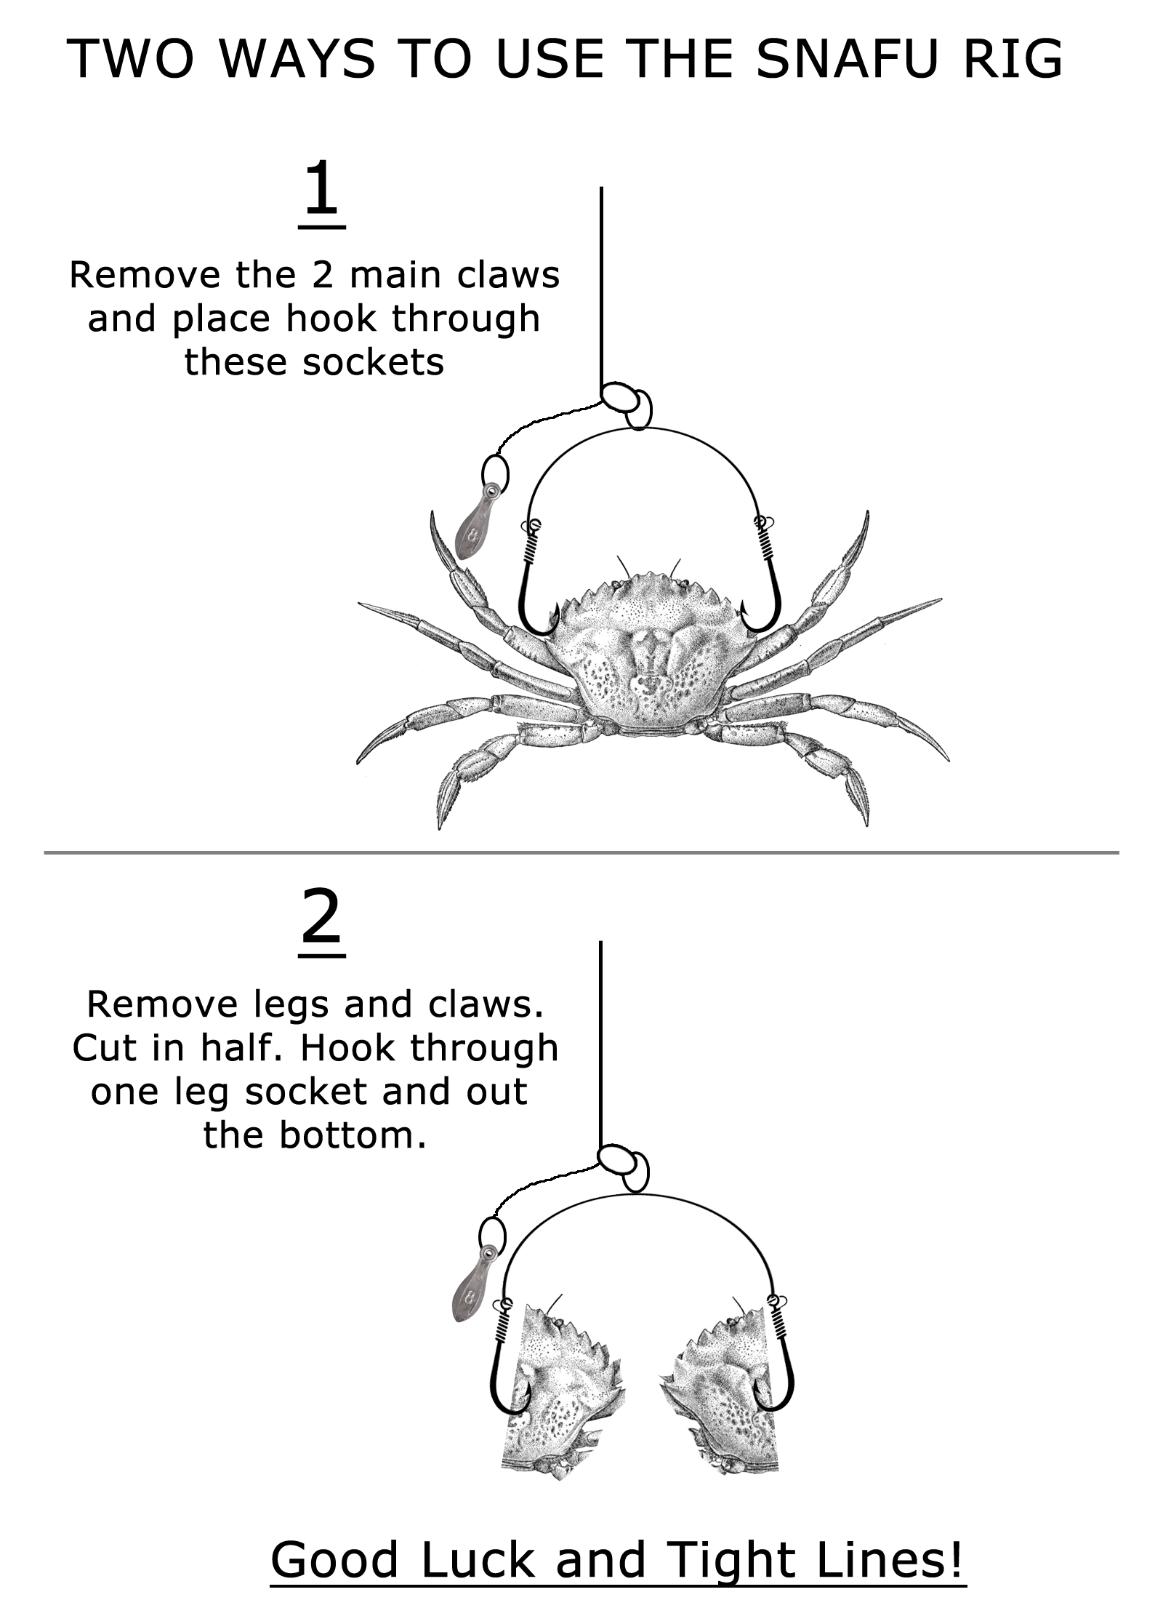 2 Blackfish tautogue Noir Pêche Rigs TIDE RITE R452 Octopus piscine gagnant 1 Crochet Rig